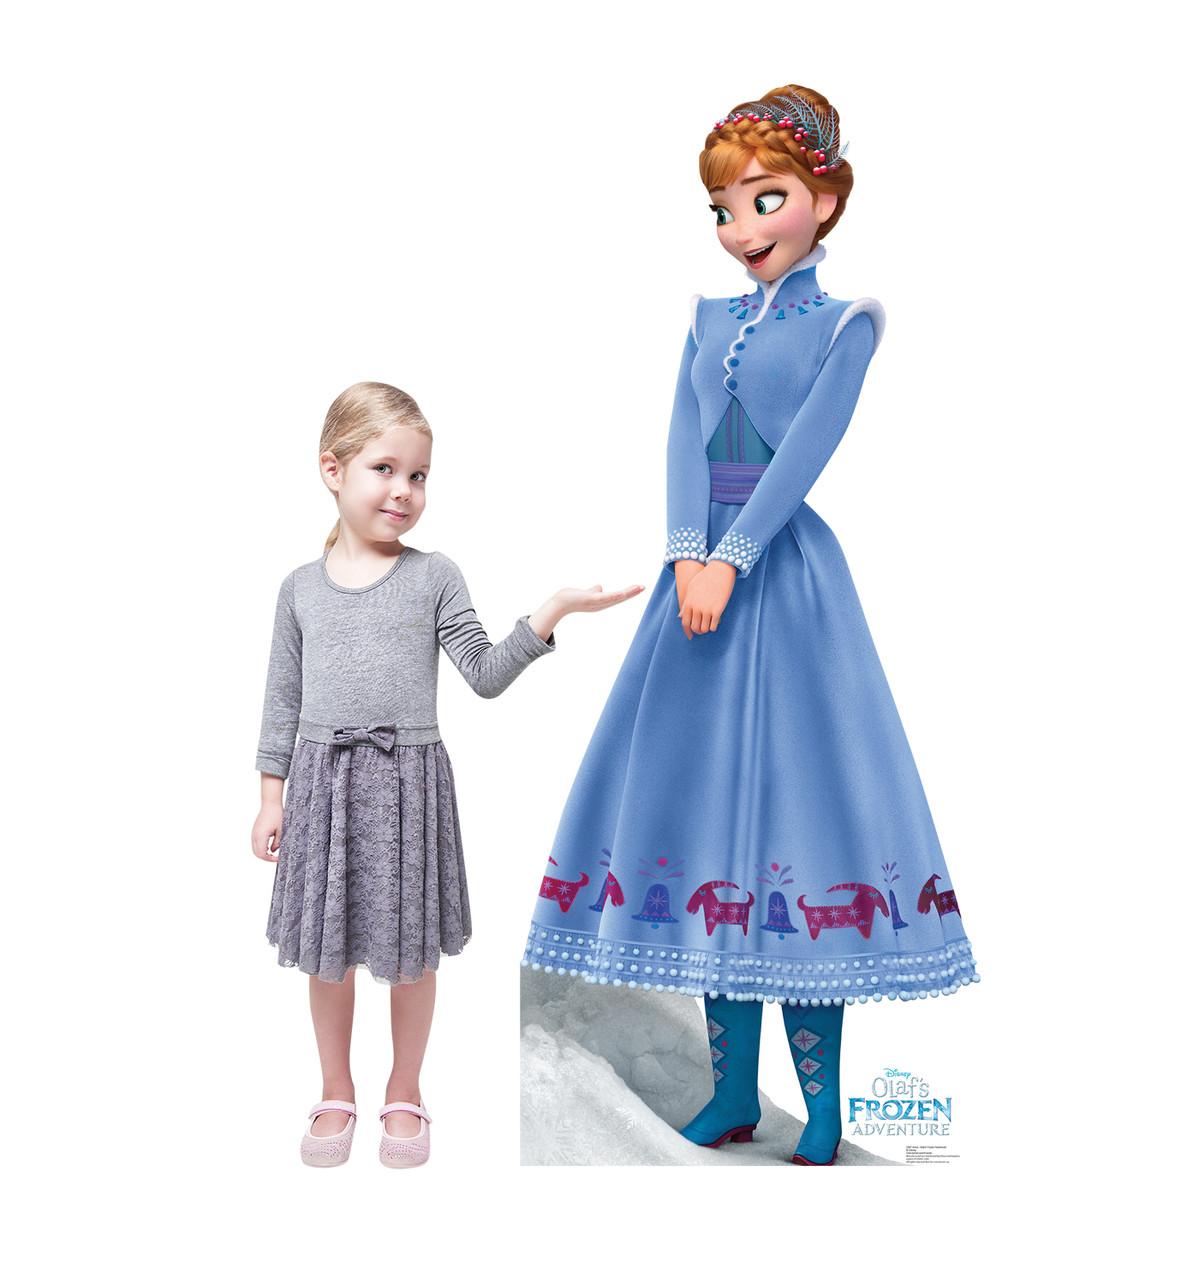 Anna (Olafs Frozen Adventure) | Cardboard Cutout 3